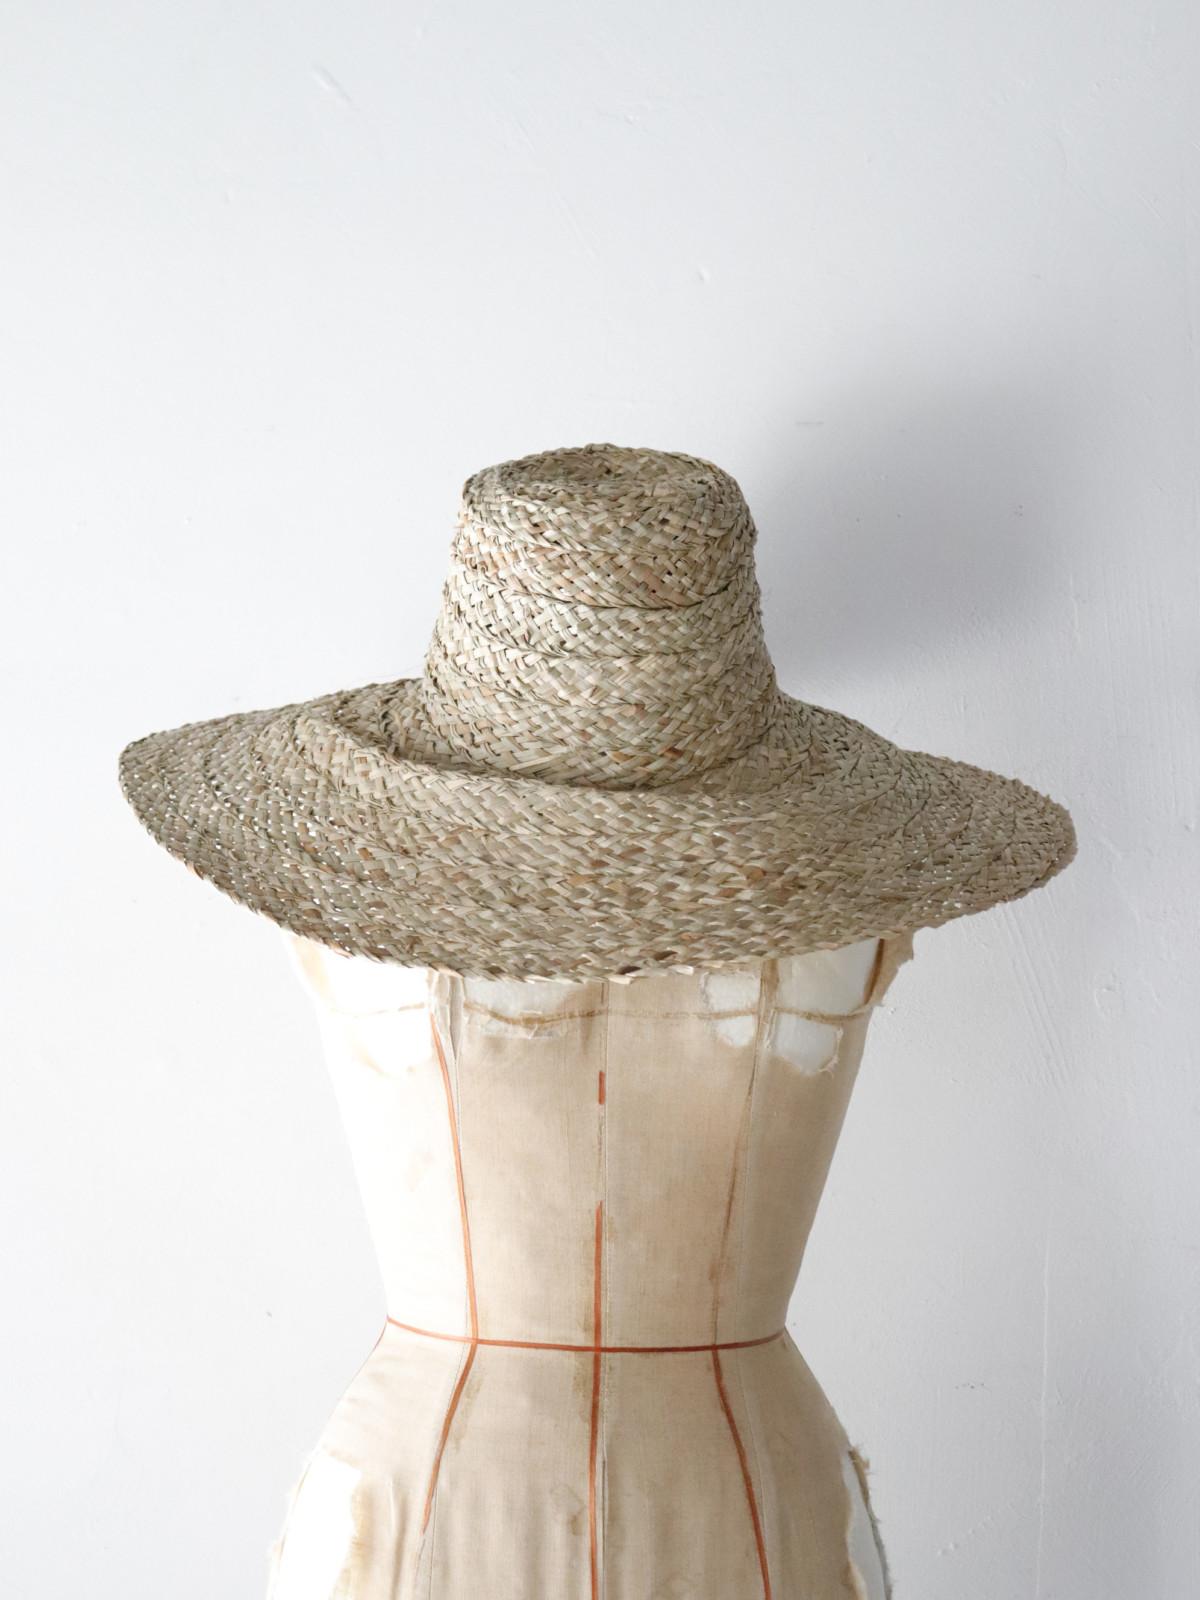 New, straw hat, Africa